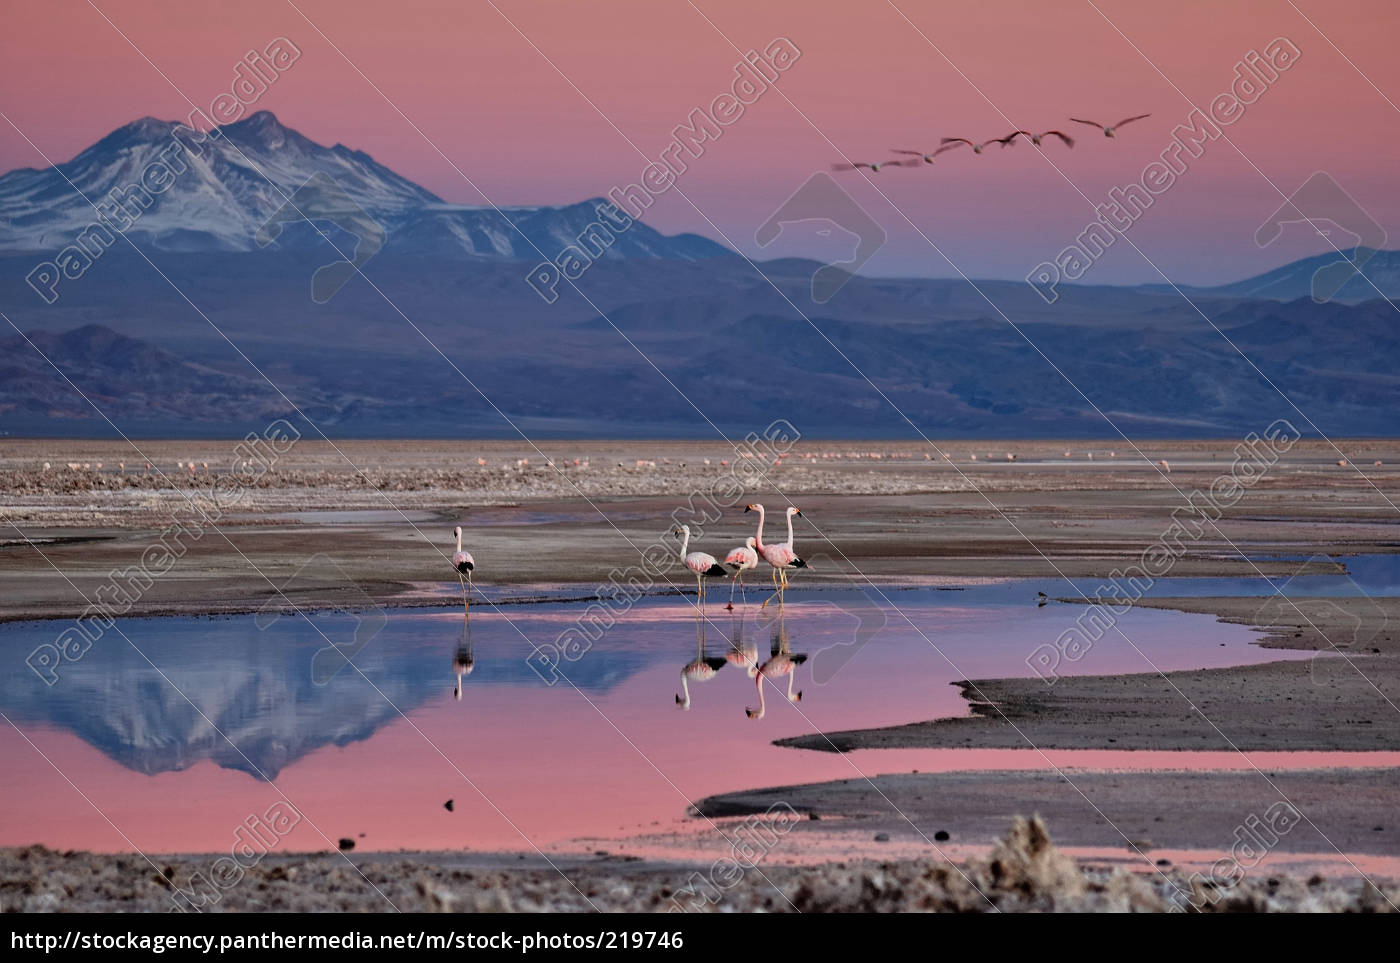 flamingos, at, sunset - 219746